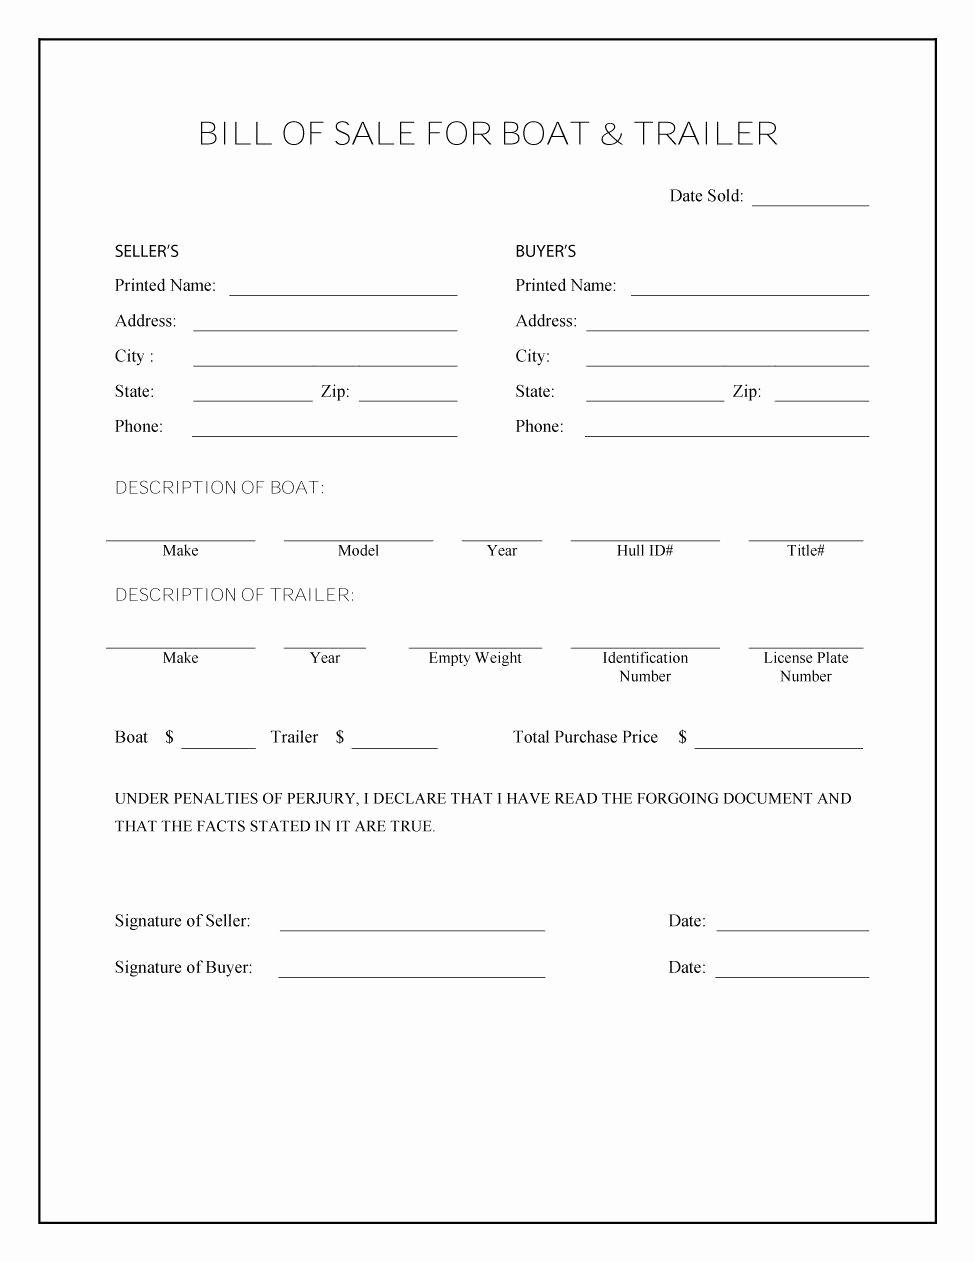 Bill Of Sale Automobile Template Elegant 45 Fee Printable Bill Of Sale Templates Car Boat Gun